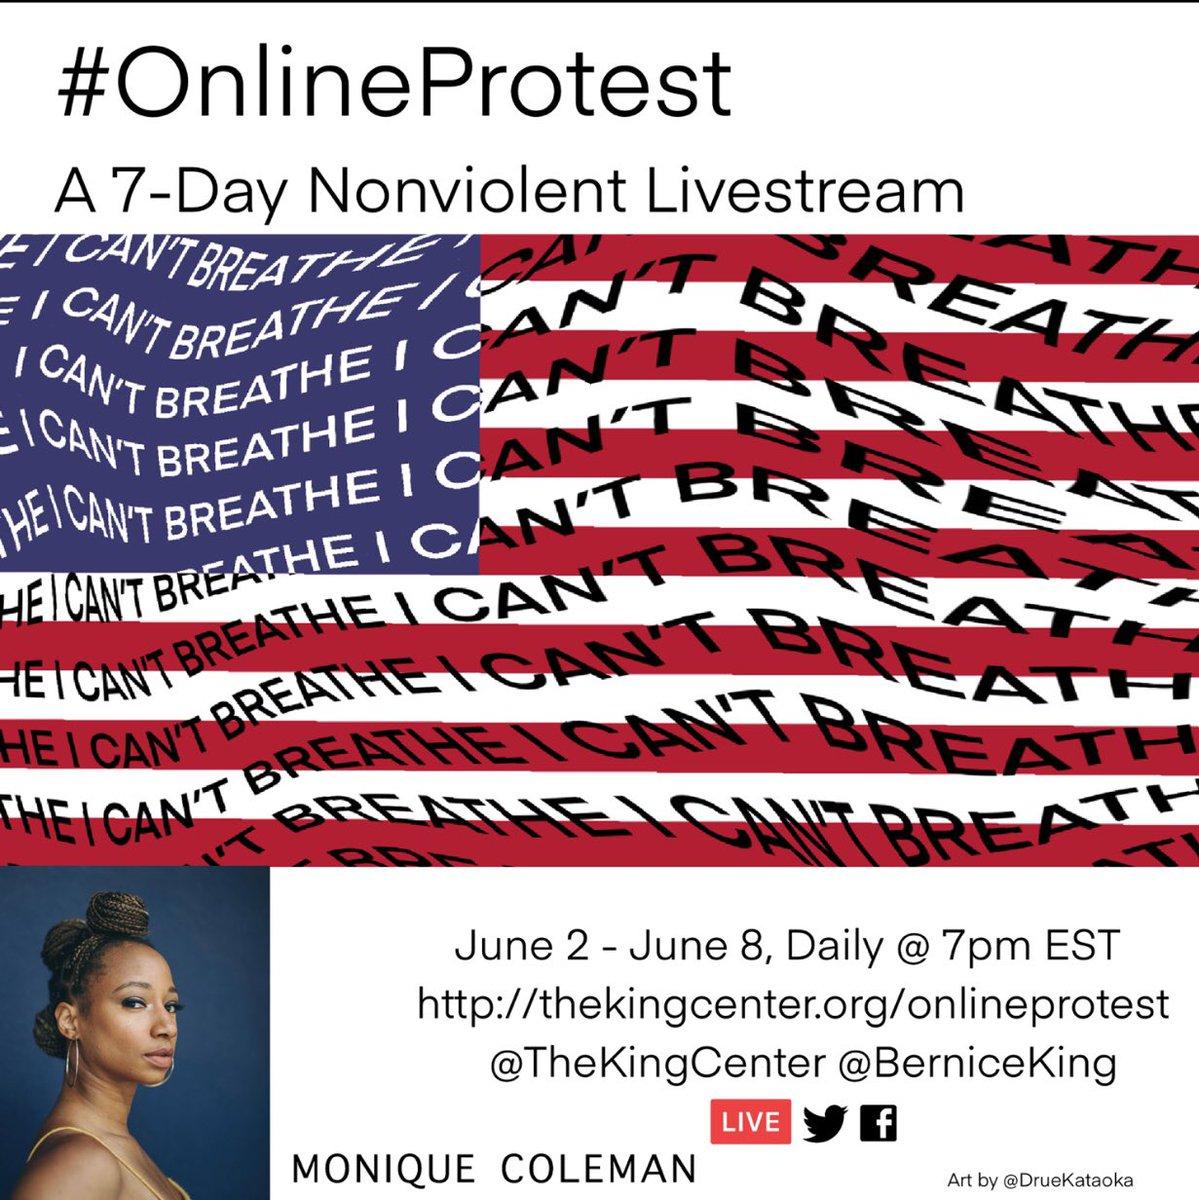 Join the #OnlineProtest TONIGHT at 7pm EST/ 4pm PST https://t.co/0kwGUgsR80 I'm so honored to lend my voice to this monumental event! @BerniceKing @TheKingCenter @DrueKataoka ✊🏾🙏🏾♥️ https://t.co/H6xlifuZ4F